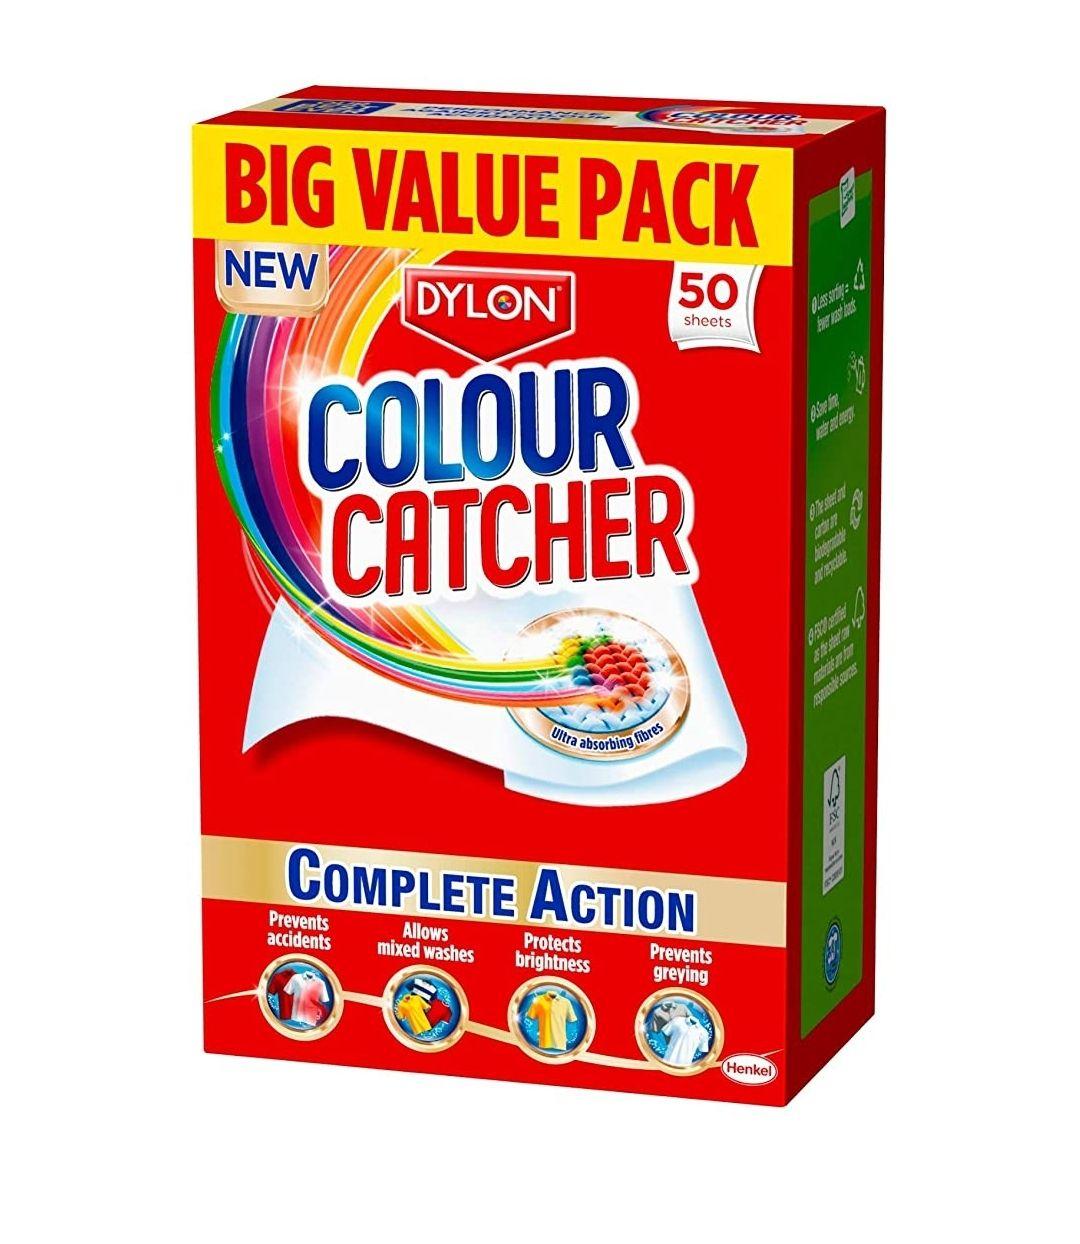 Colour catcher 50 sheets £3.75 (+ £4.49 Non Prime) @ Amazon. £3.56 with S&S